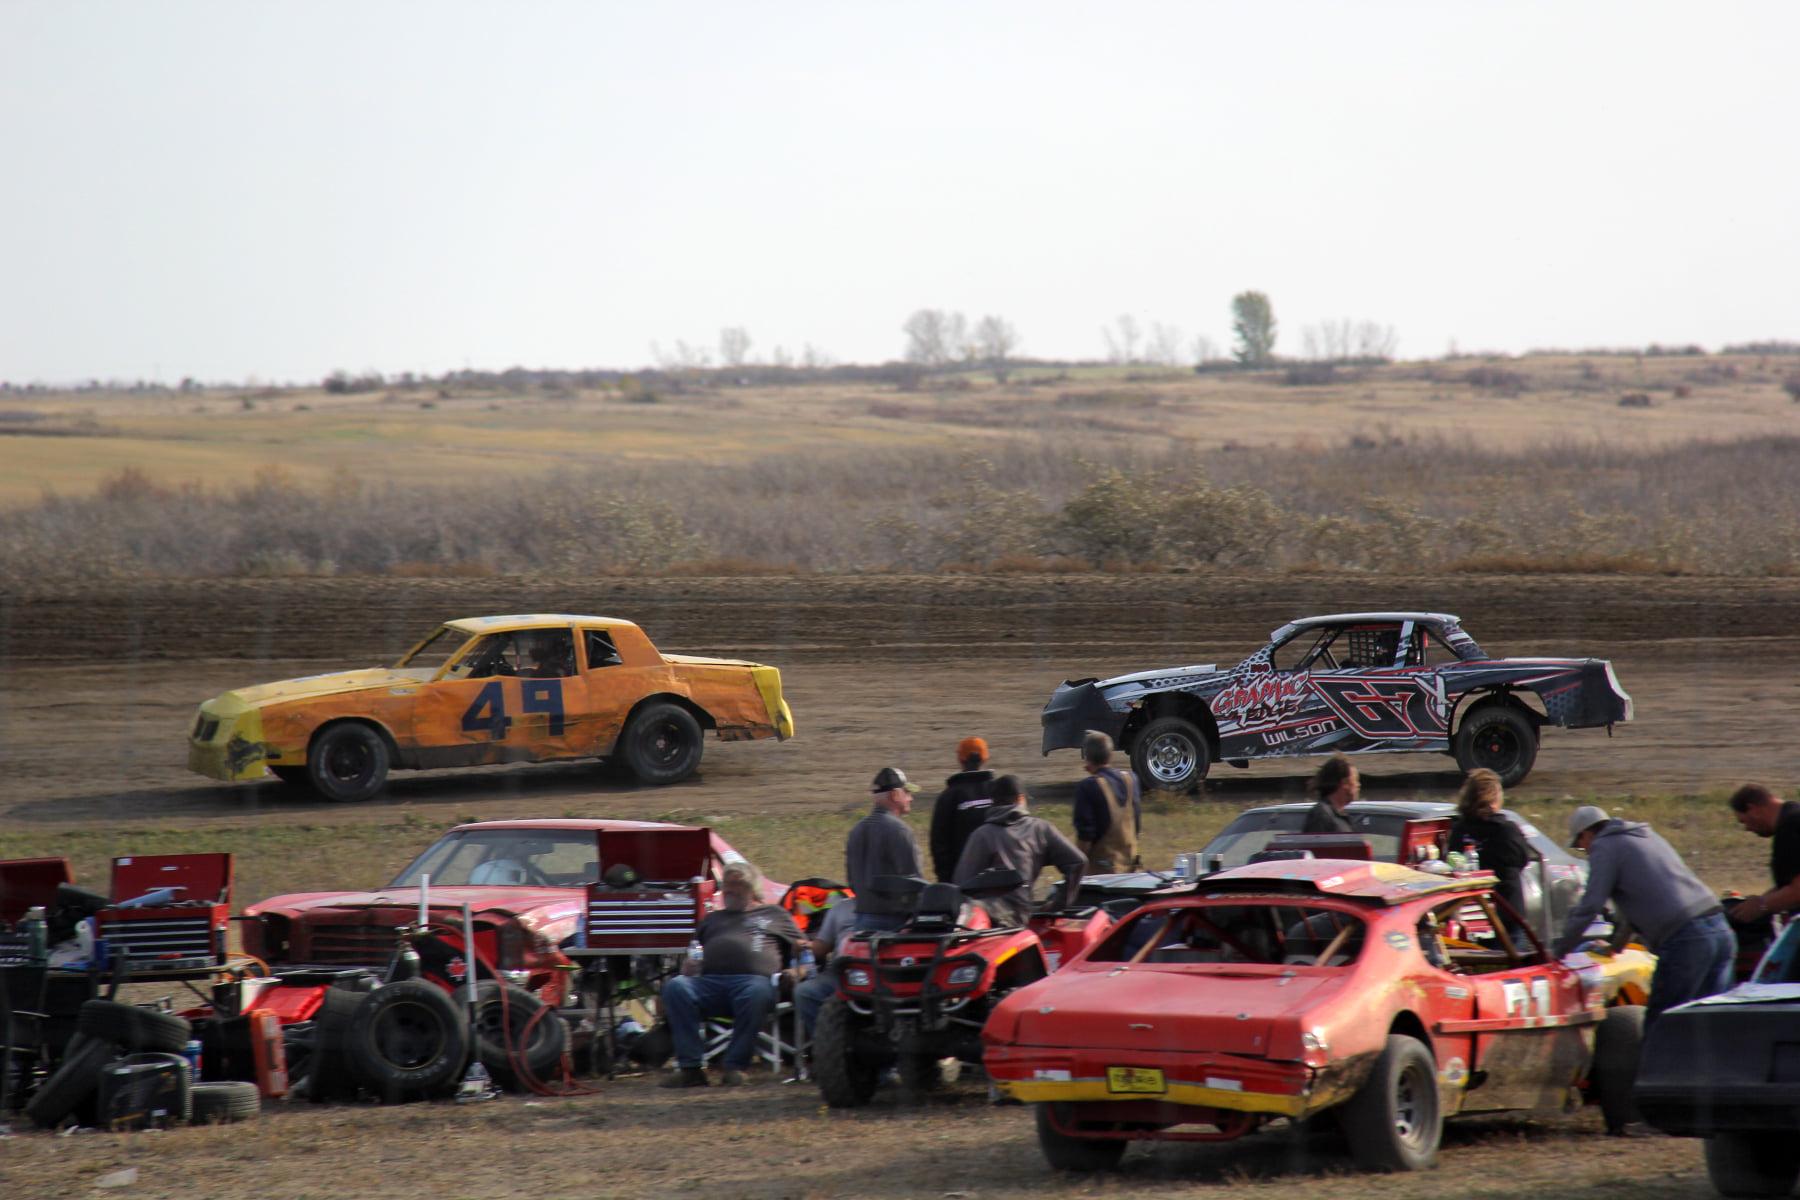 Outlook_Racing_Kemmer_Racing_Photography_16.jpg